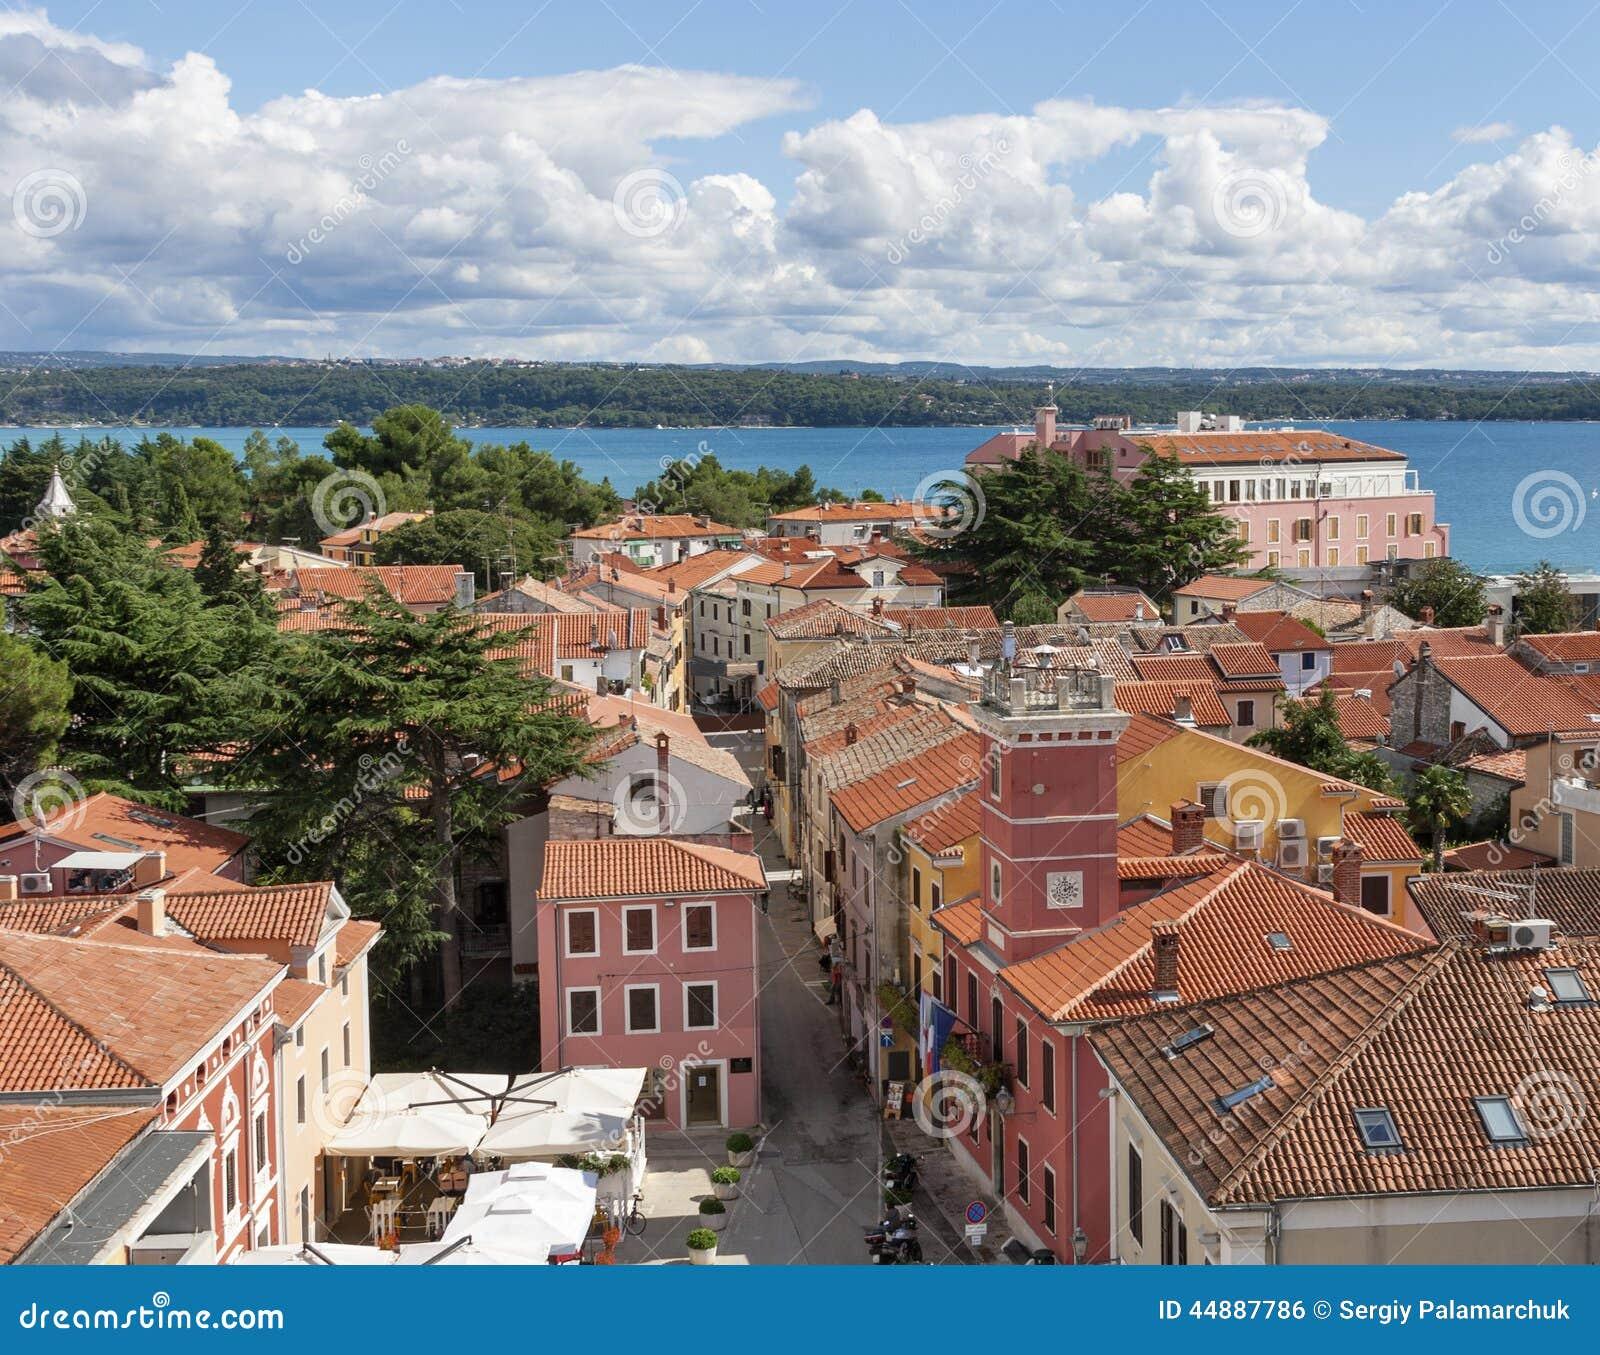 Mediterranean Style Houses With Ocean Views: Novigrad Cityscape, Istria, Croatia Stock Photo